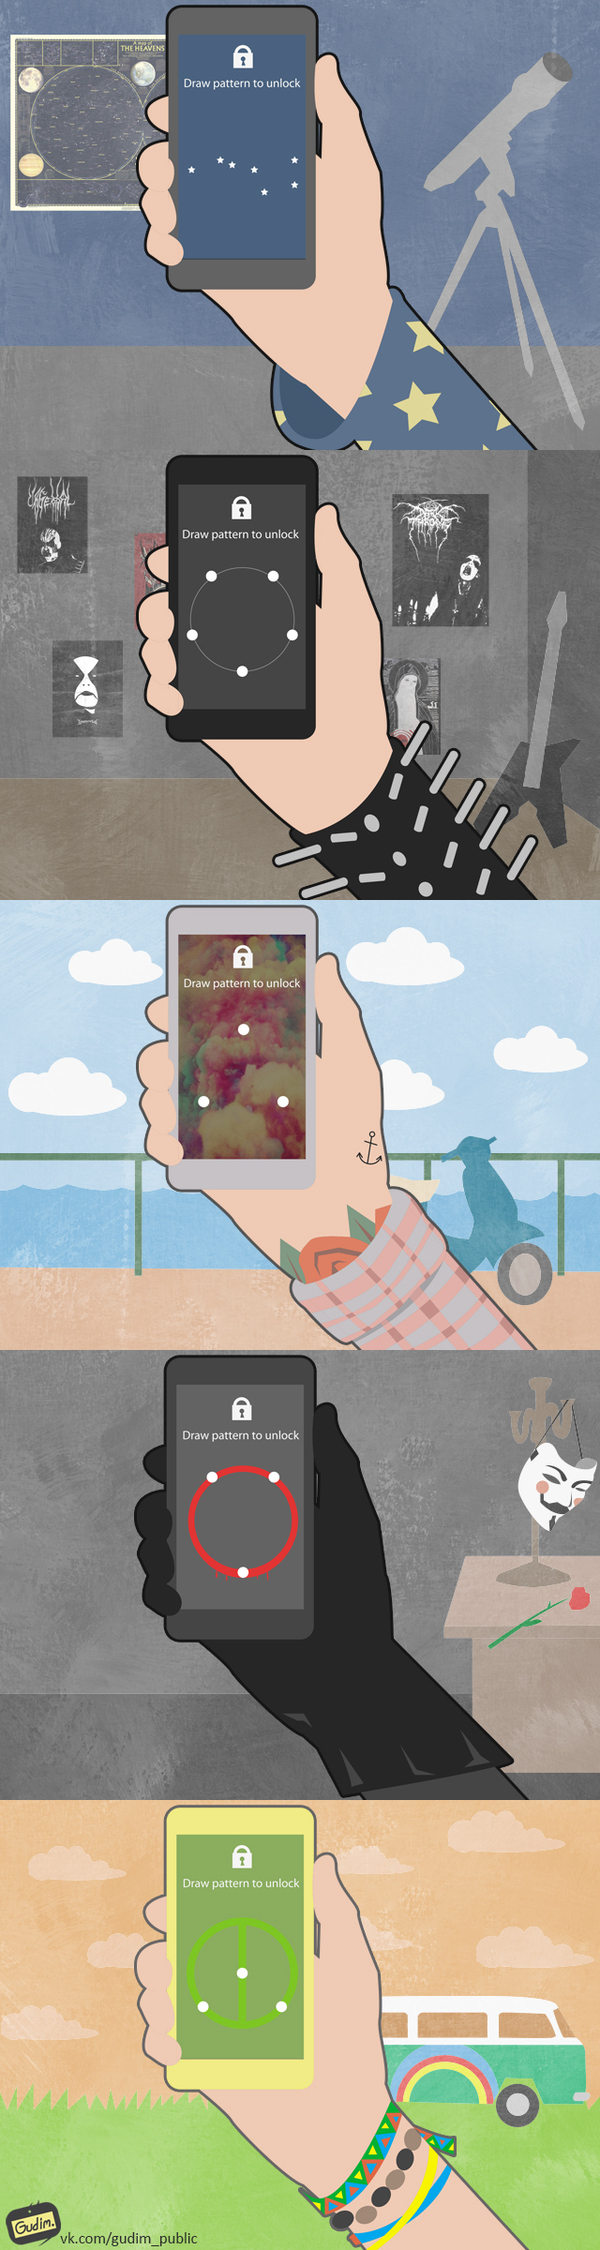 Введите графический ключ gudim, телефон, блокировка, Ключи, арт, длиннопост